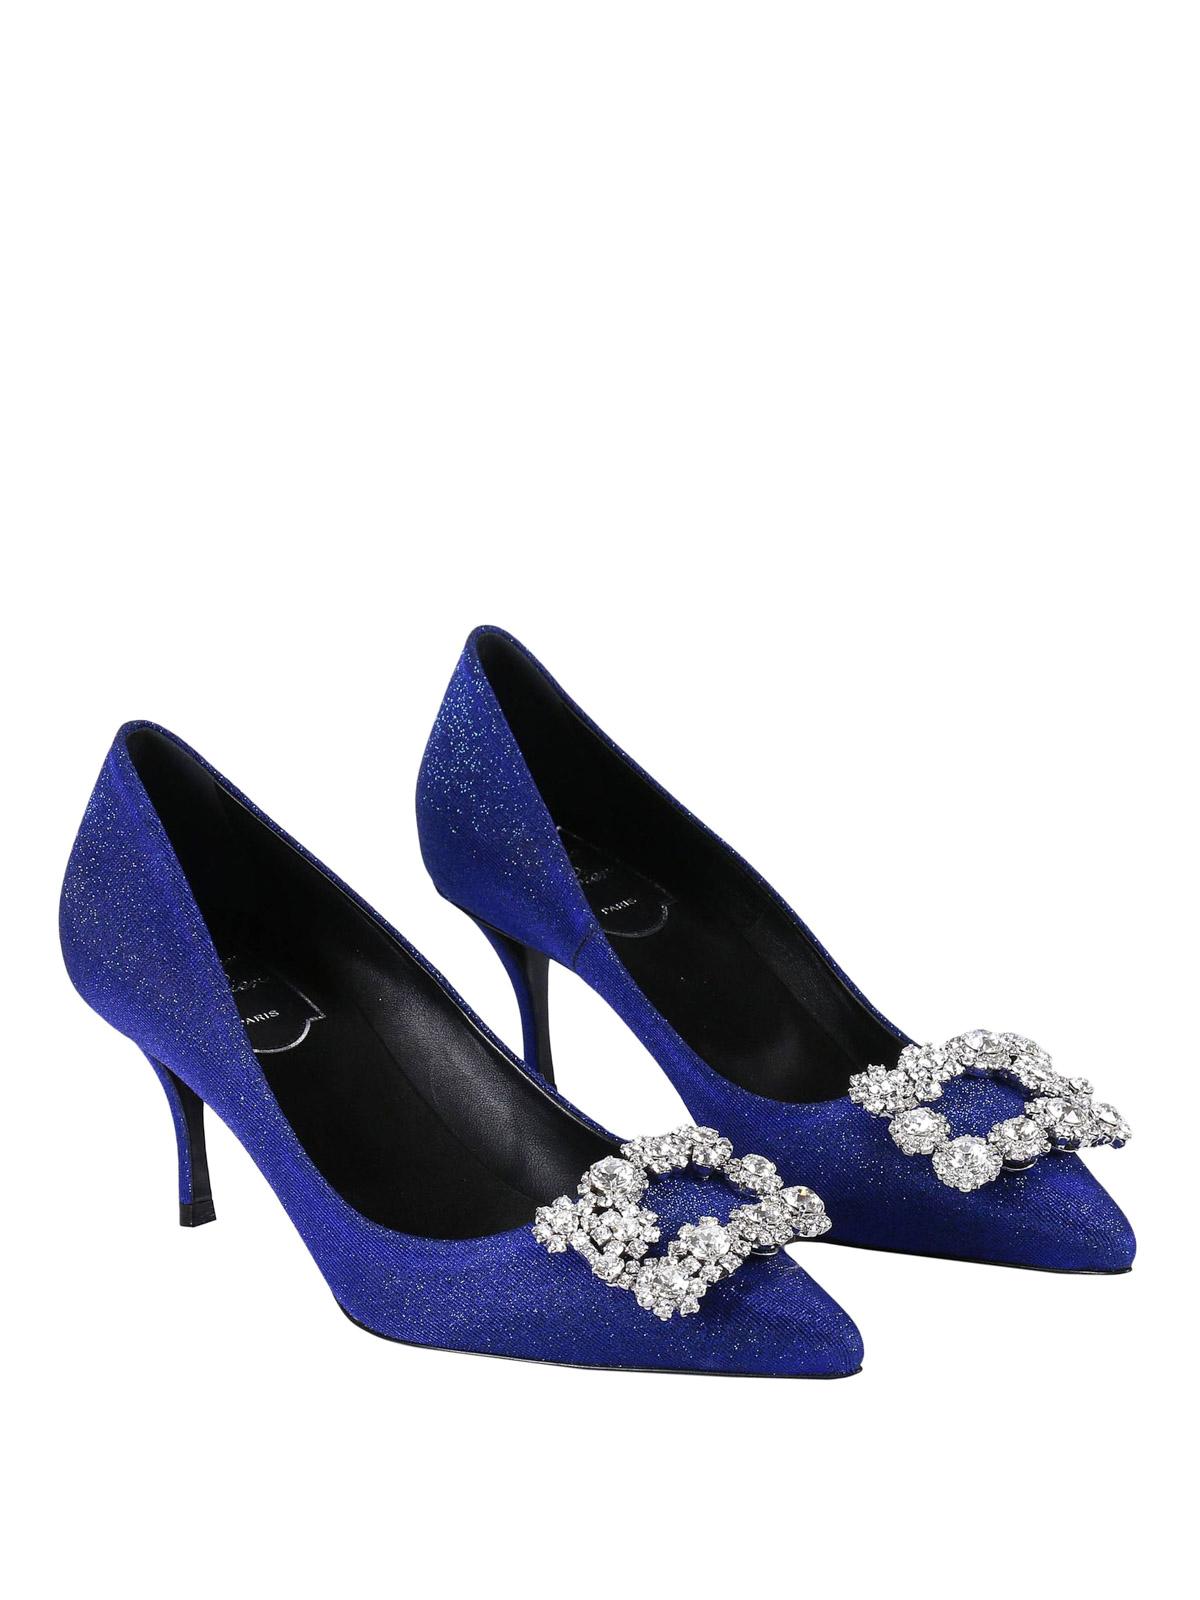 Roger Vivier - Flower Strass blue lurex